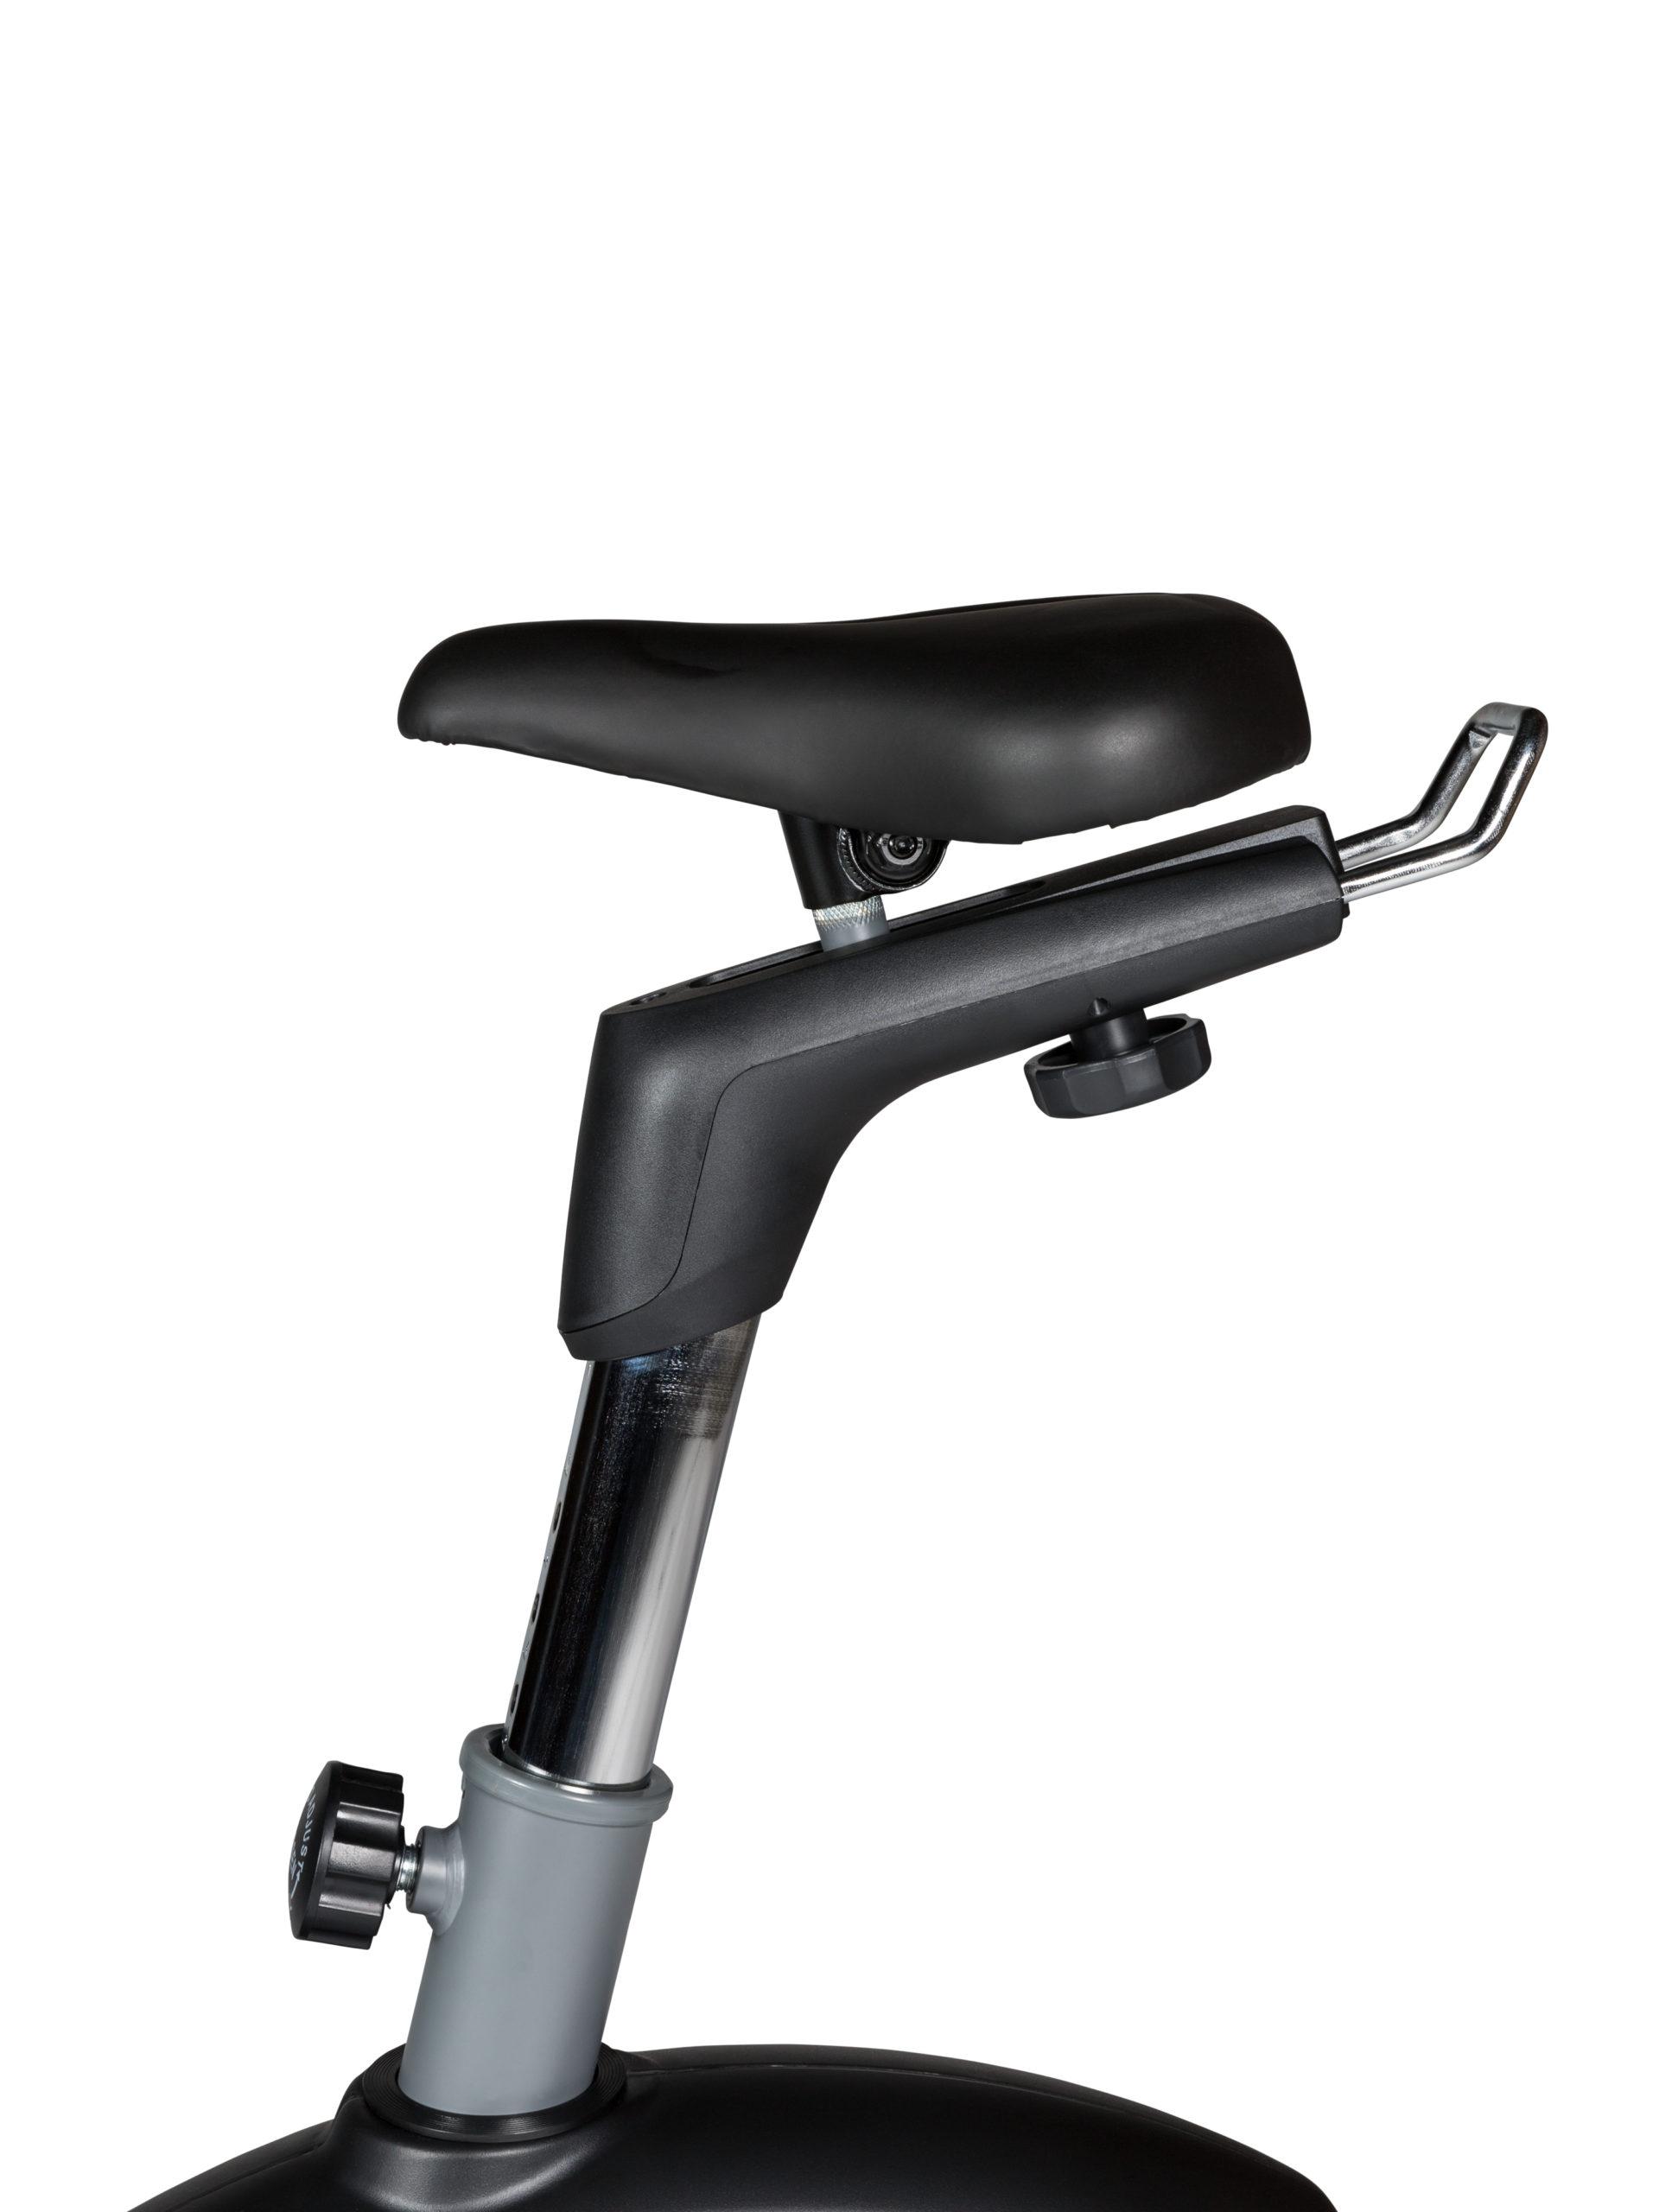 Flow Fitness Tabel Turner DHT500 Hometrainer 18